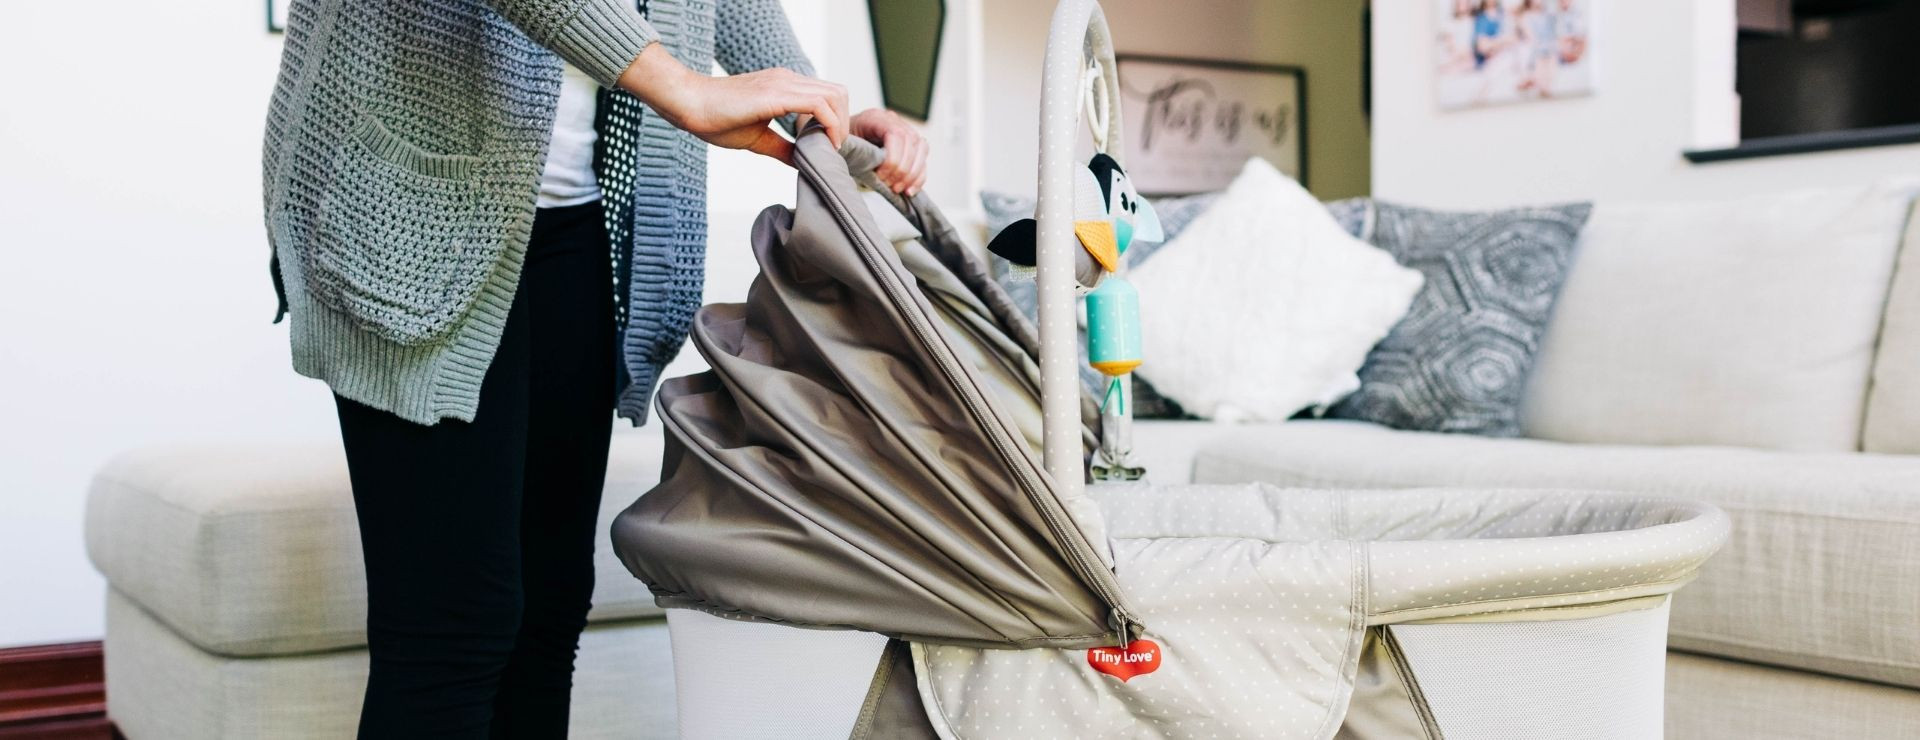 Adjustable canopy helps regulate babies' exposure to stimulation